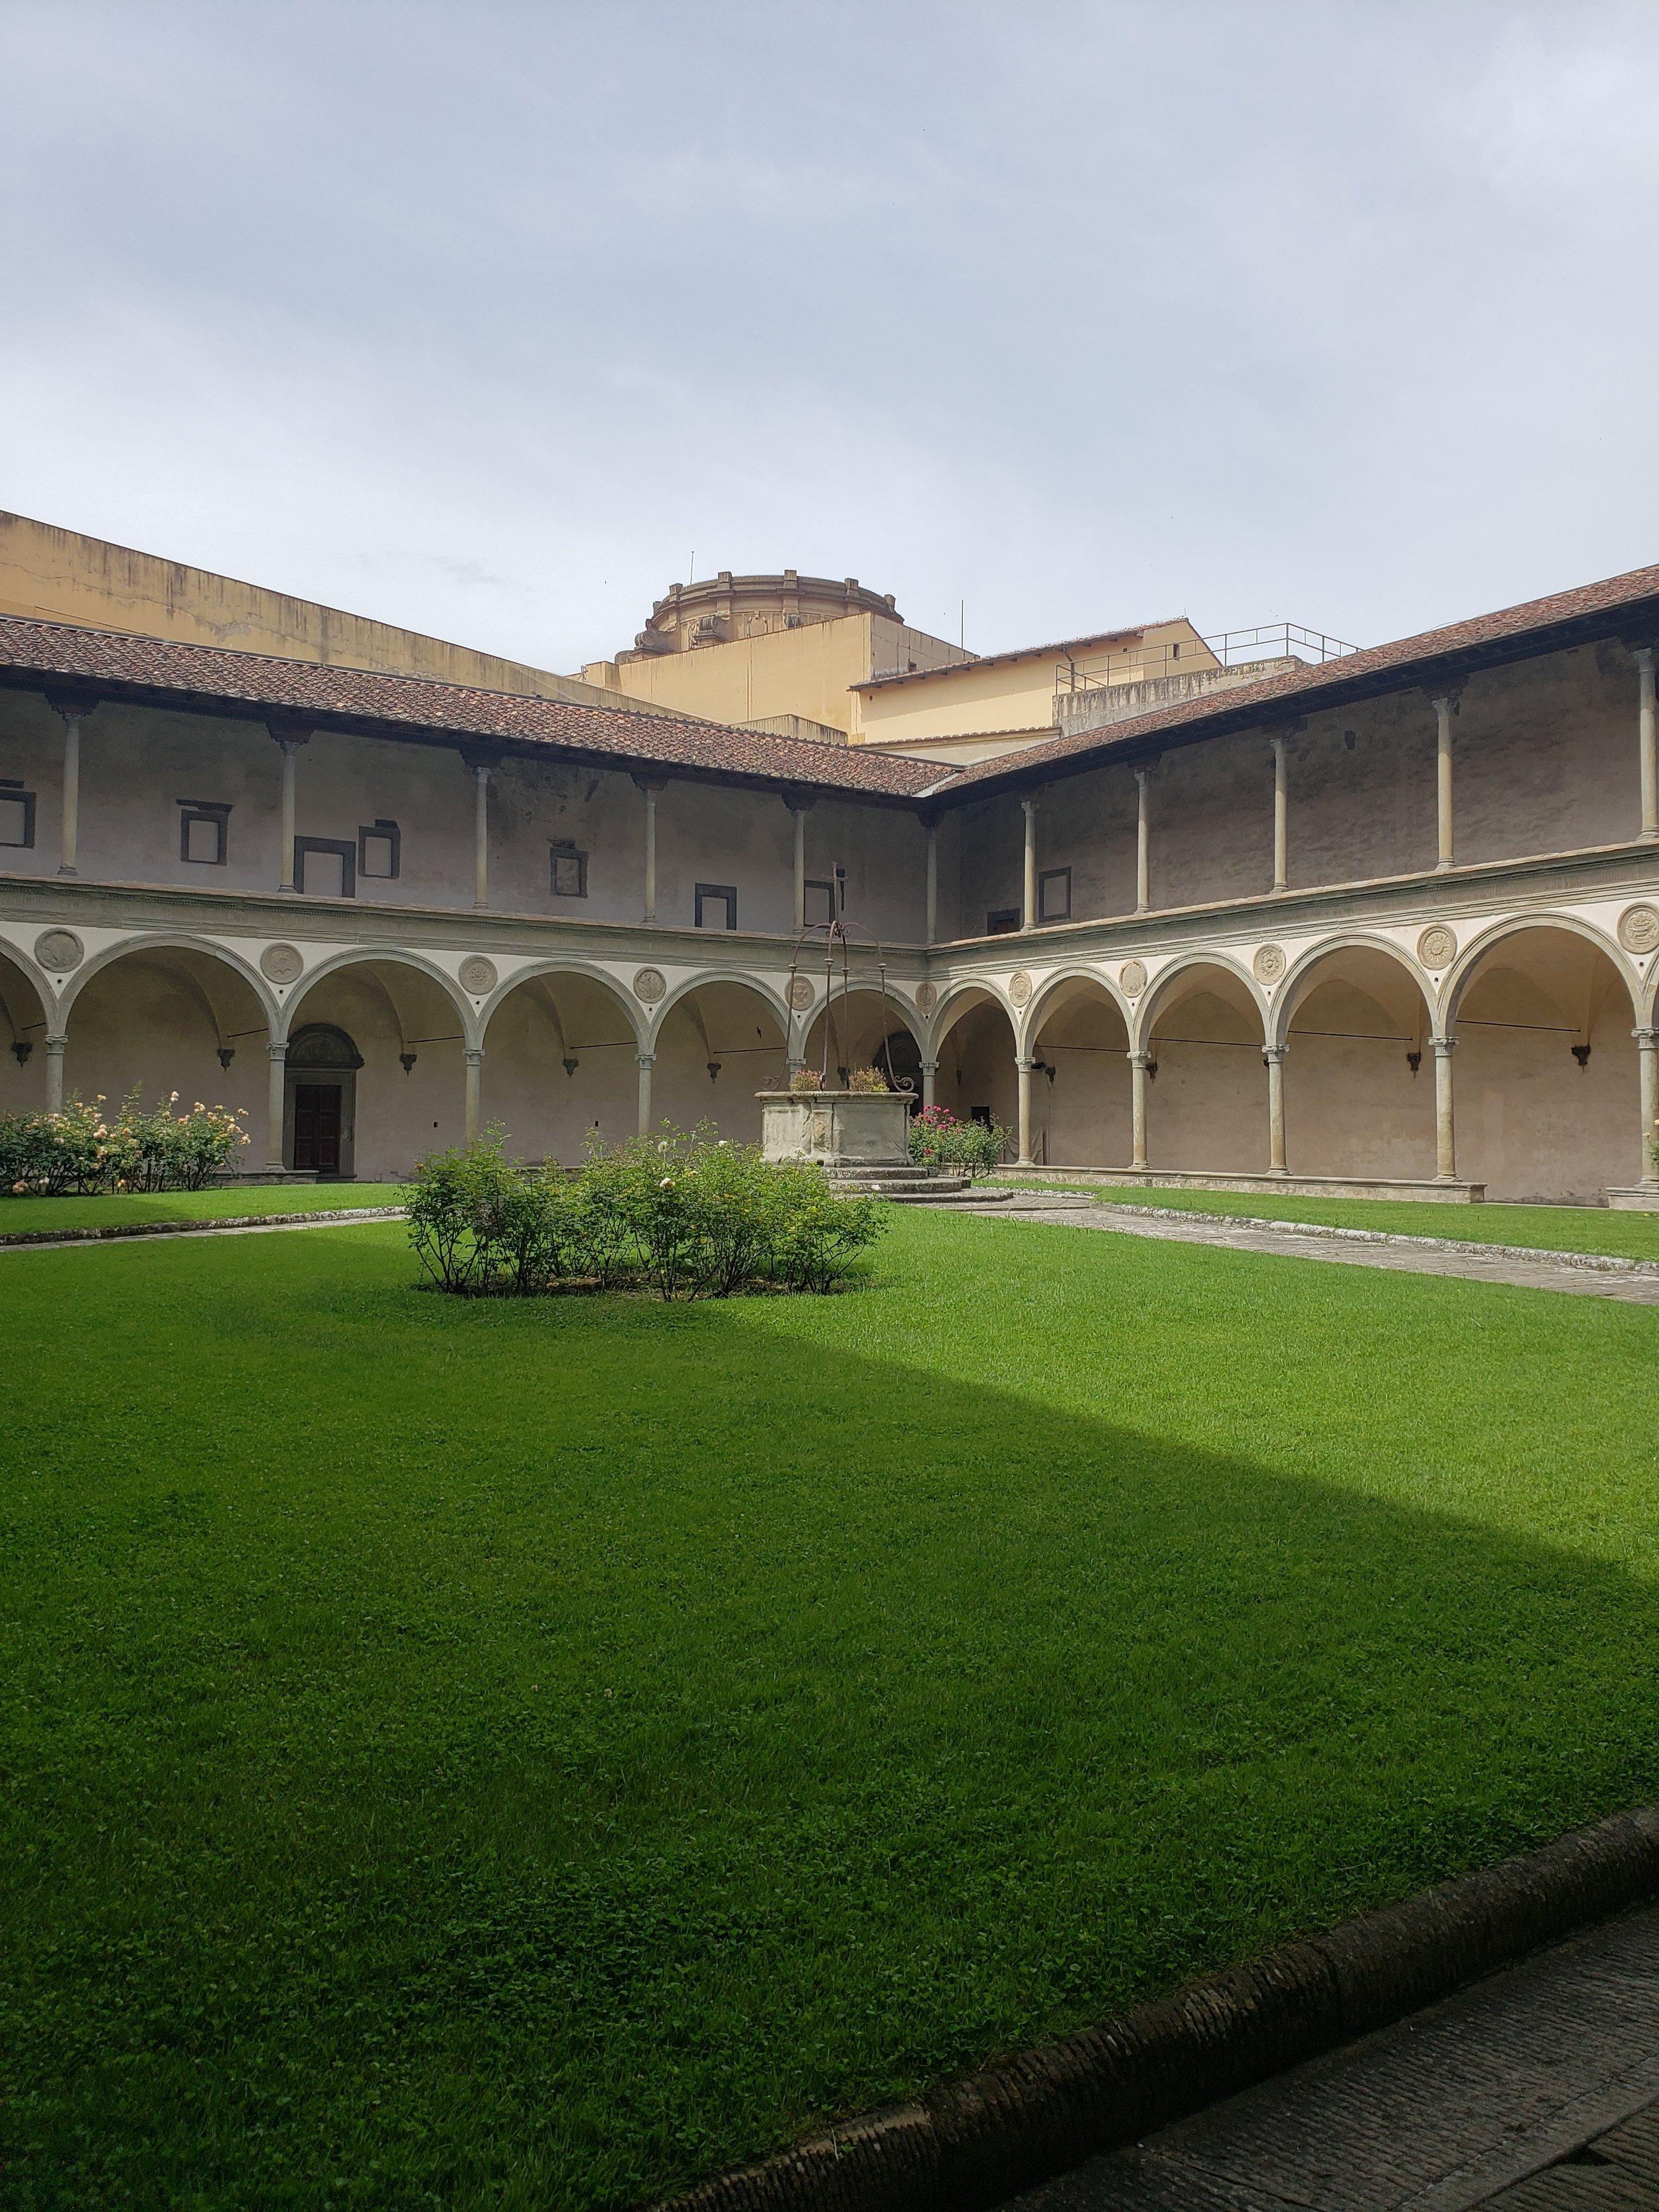 The beautiful Santa Croce cloister